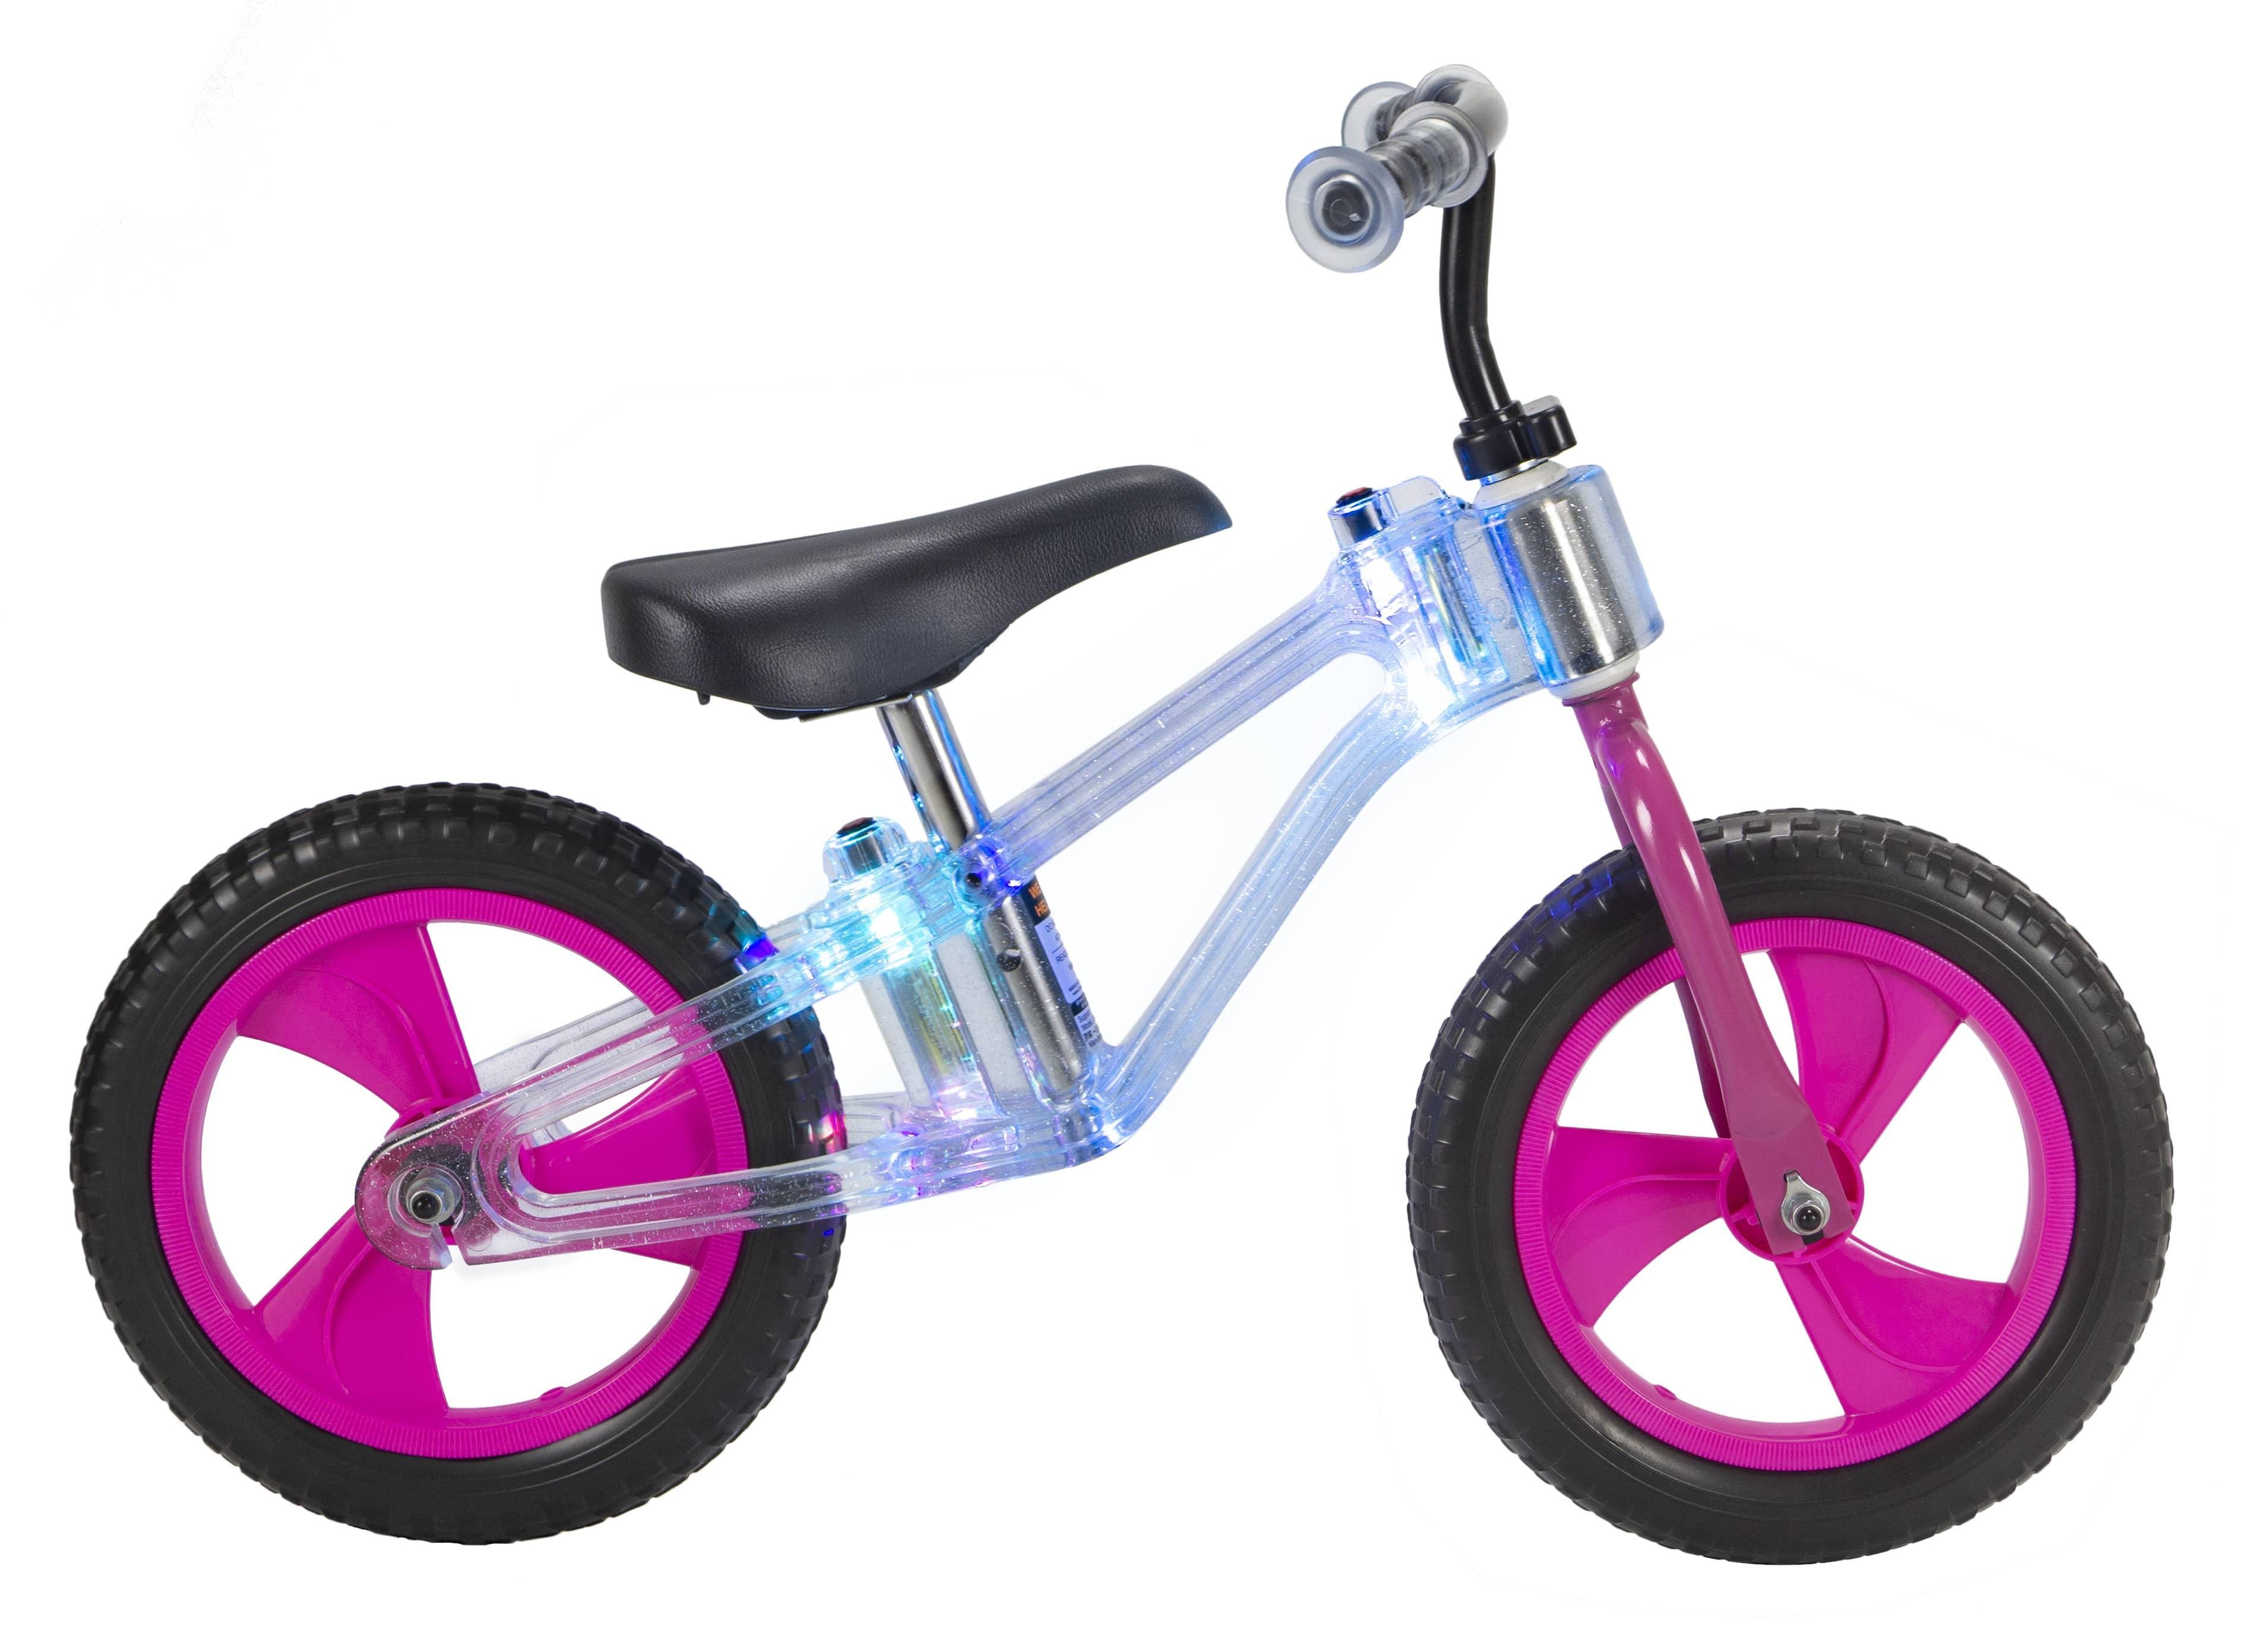 Bicicletta Senza Pedali a Led 12